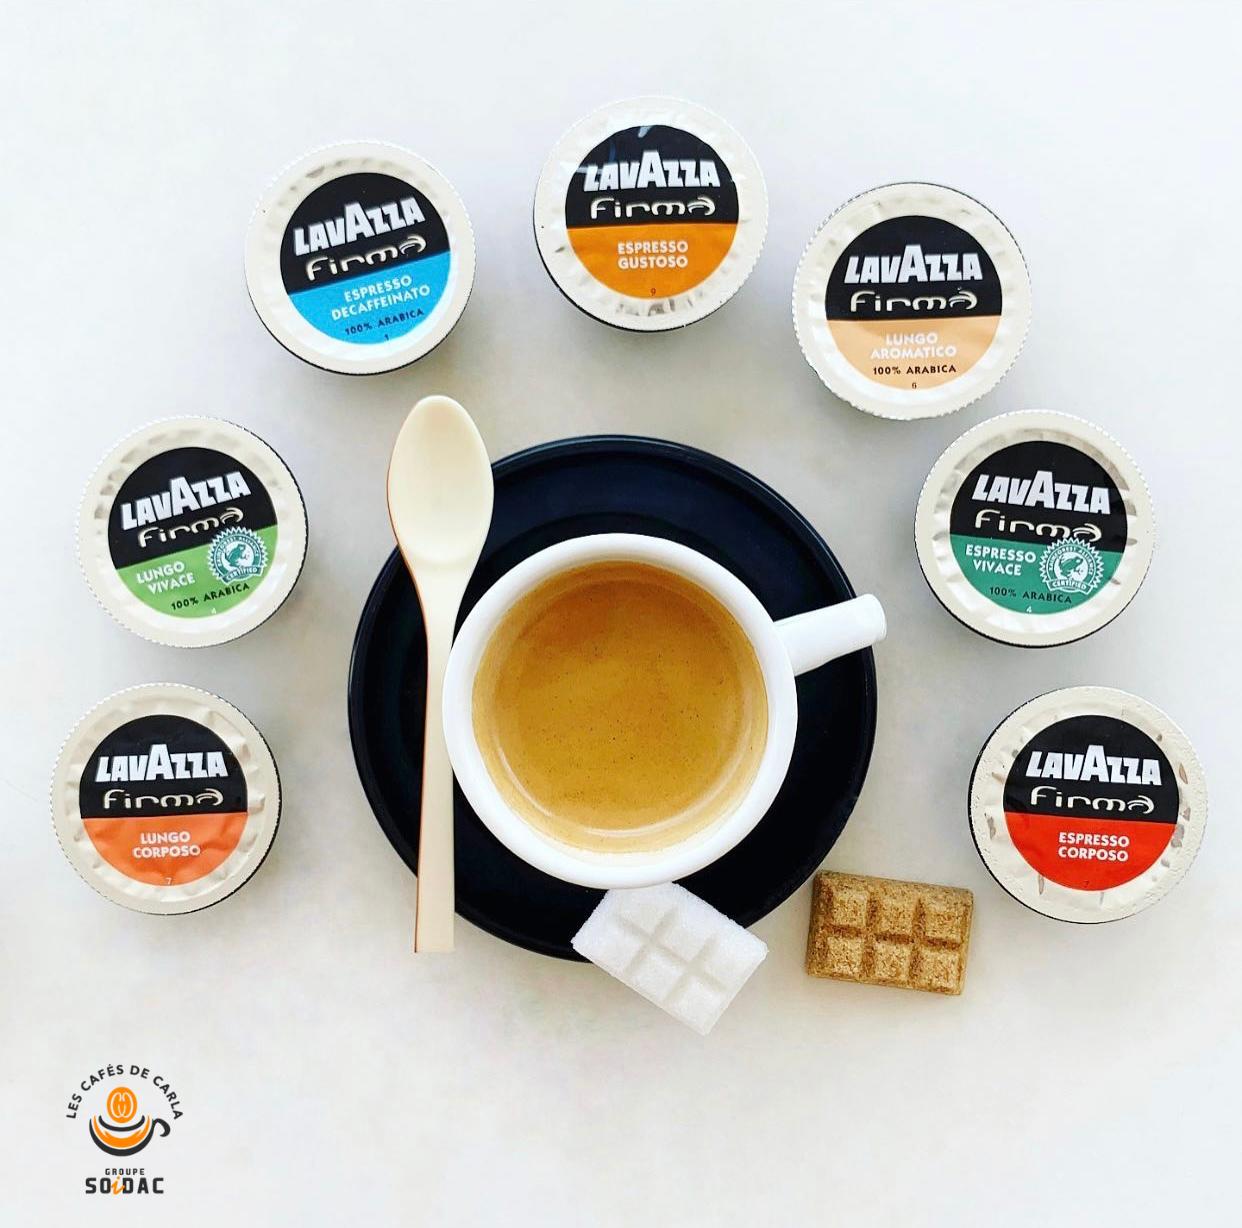 declinaison-cafe-lavazza-firma-etendue-gamme